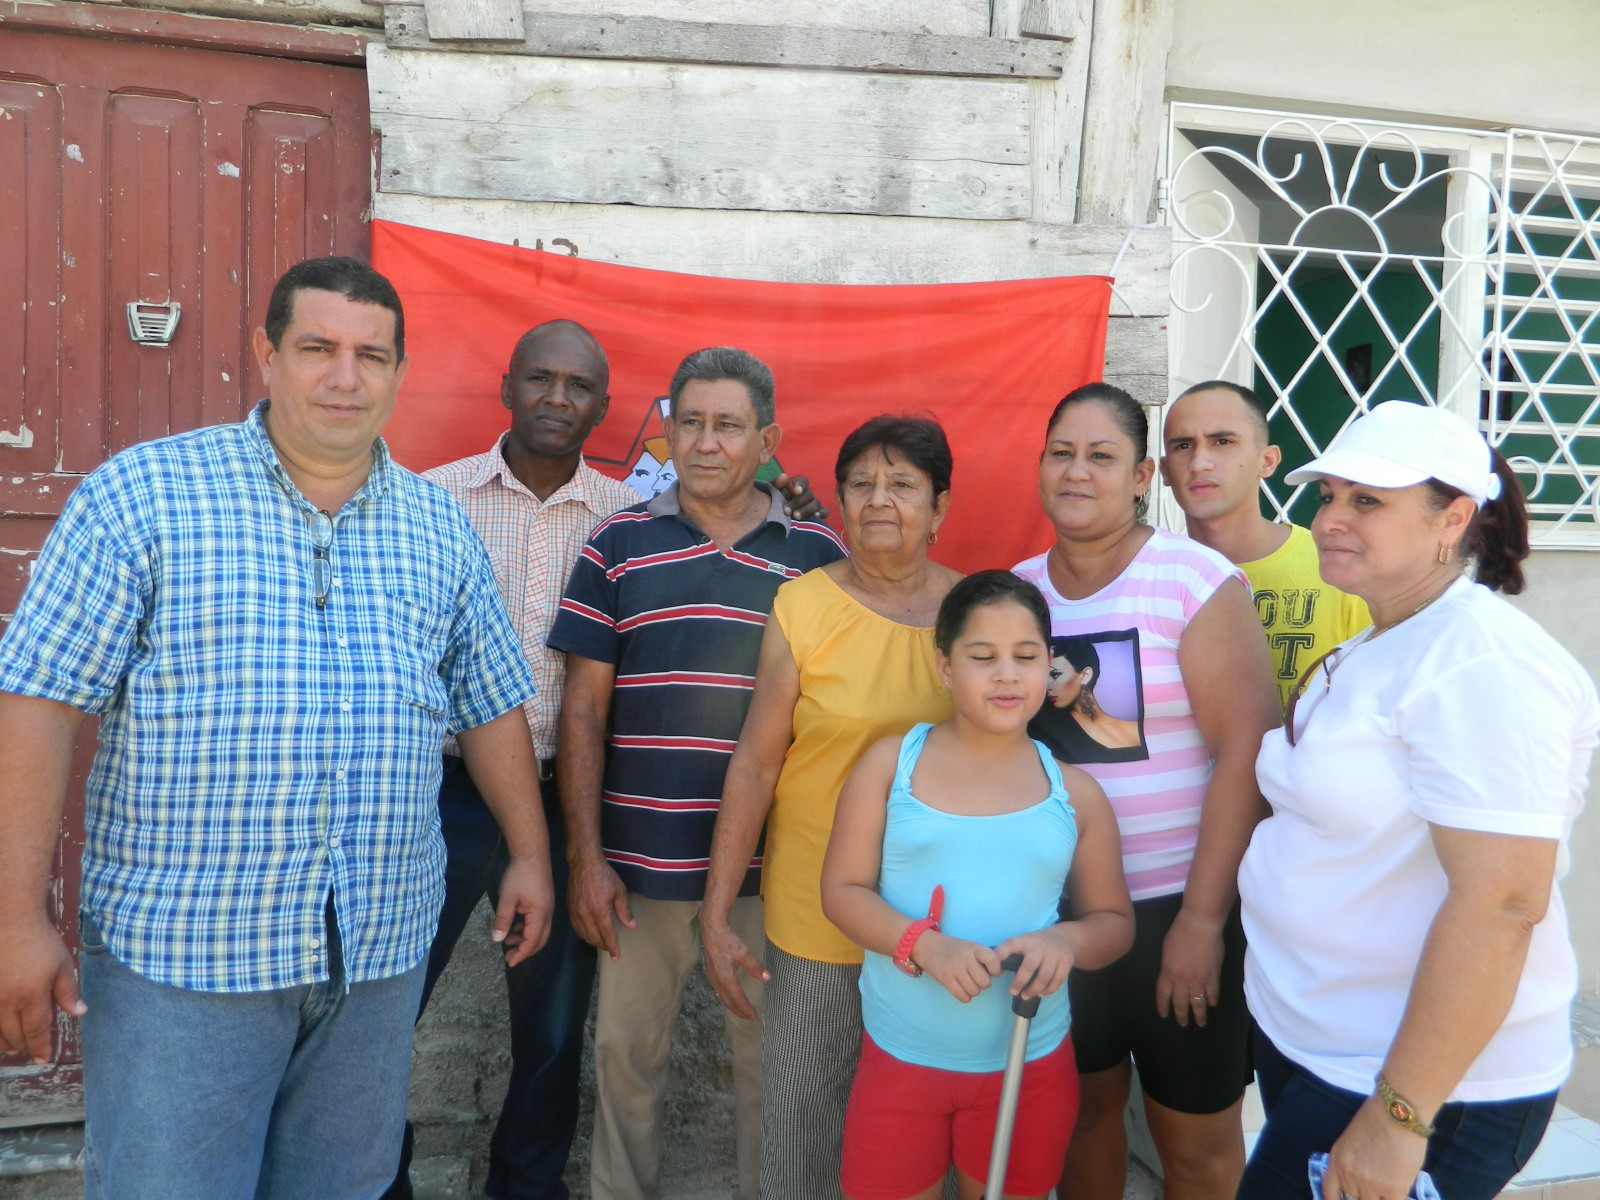 Abrazos a familias panamericanas